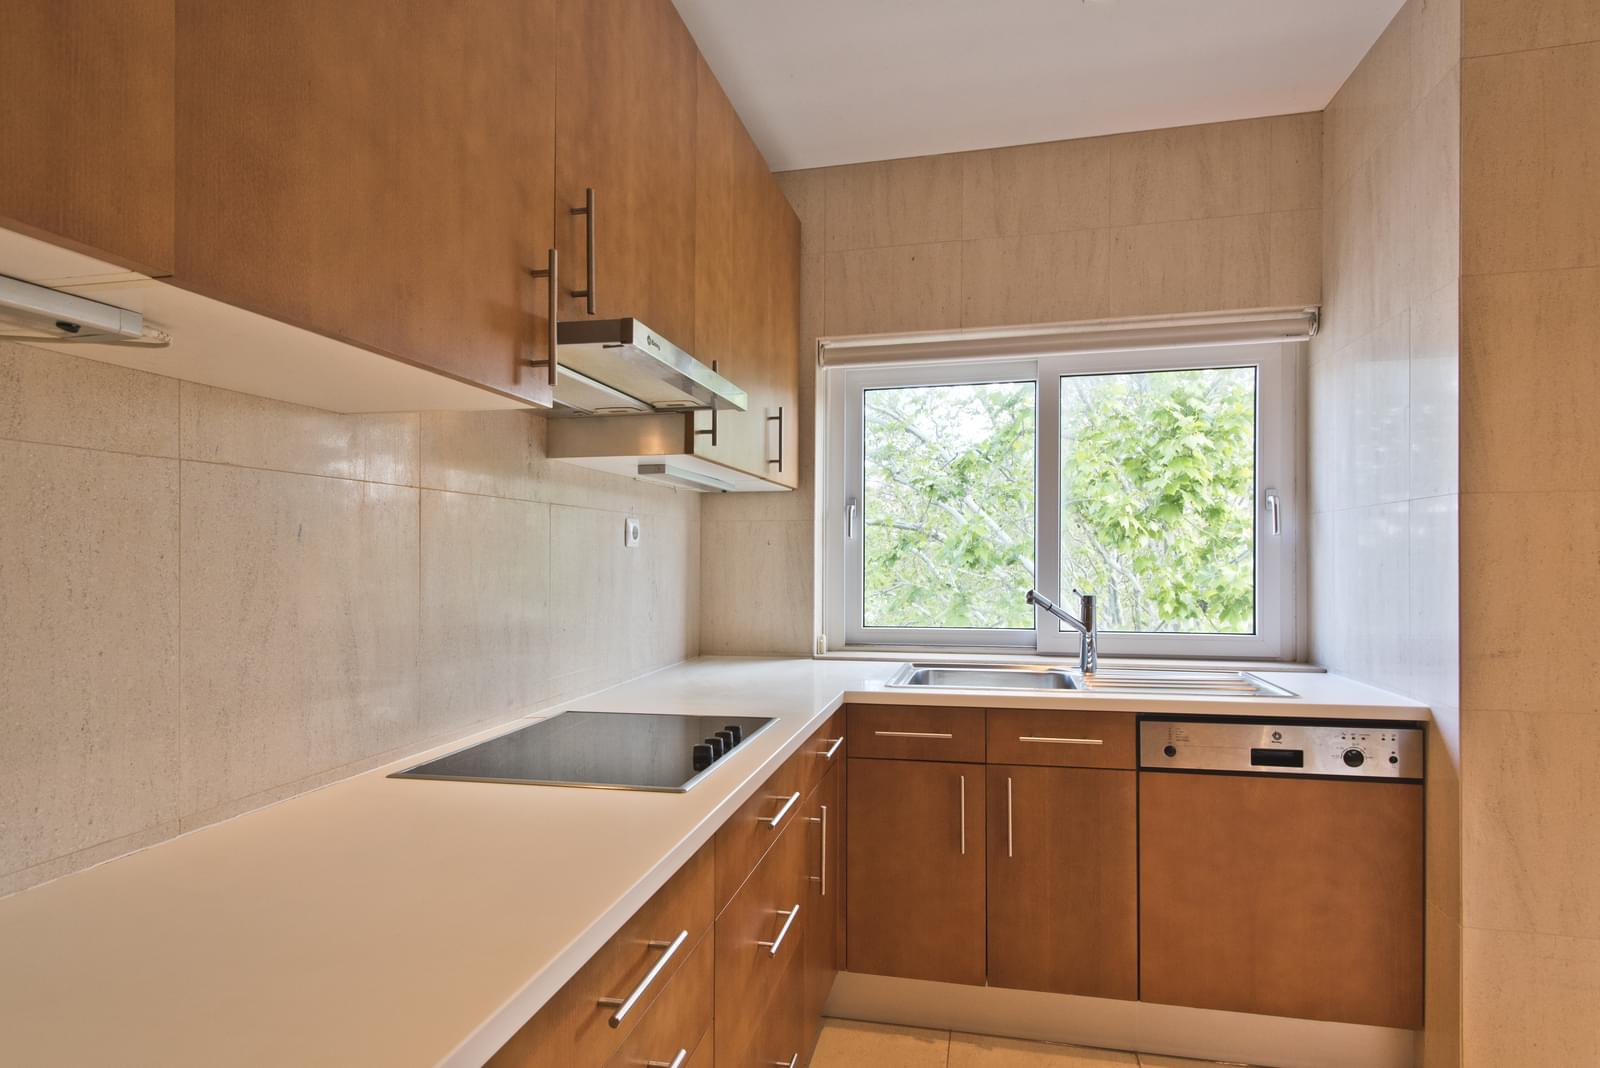 pf17006-apartamento-t1-cascais-3d6f7396-9767-4e9a-b2f5-52f945c153ea